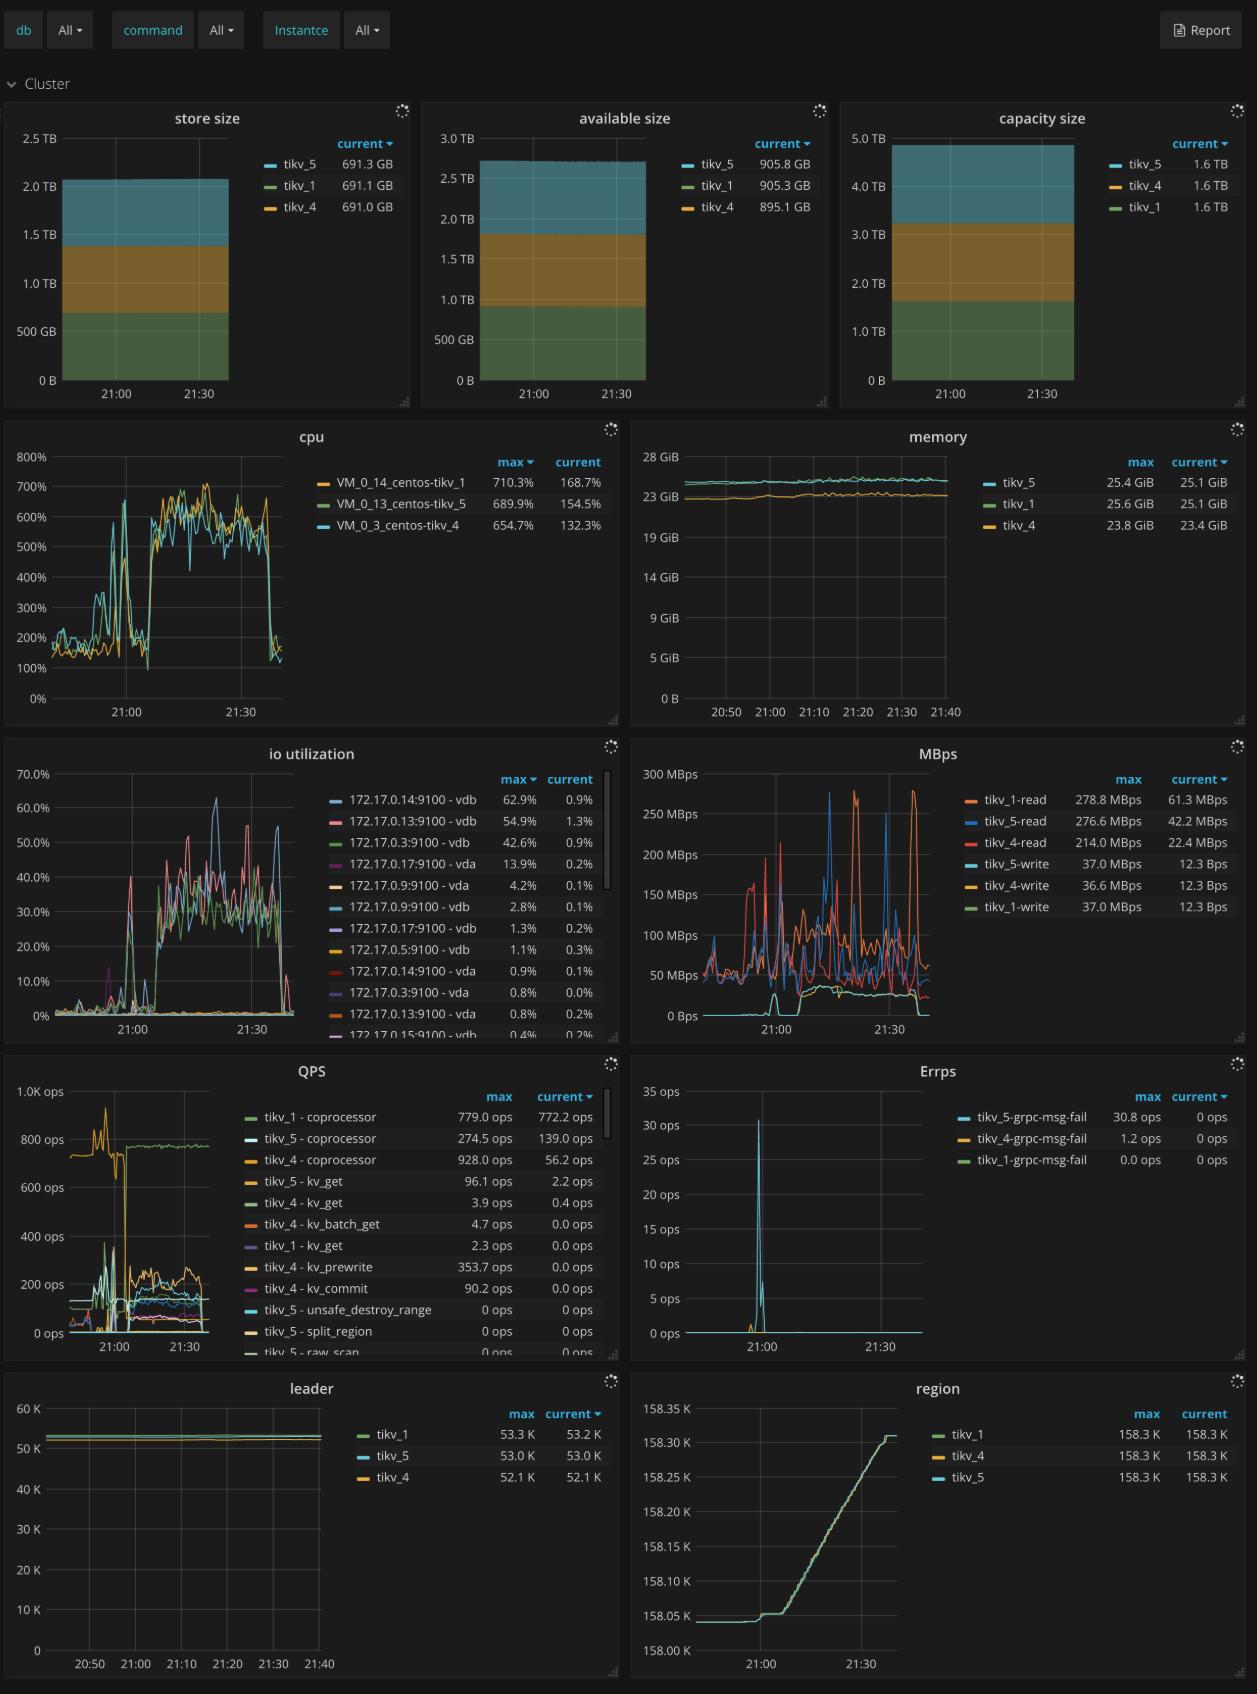 TiKV Dashboard - Cluster metrics